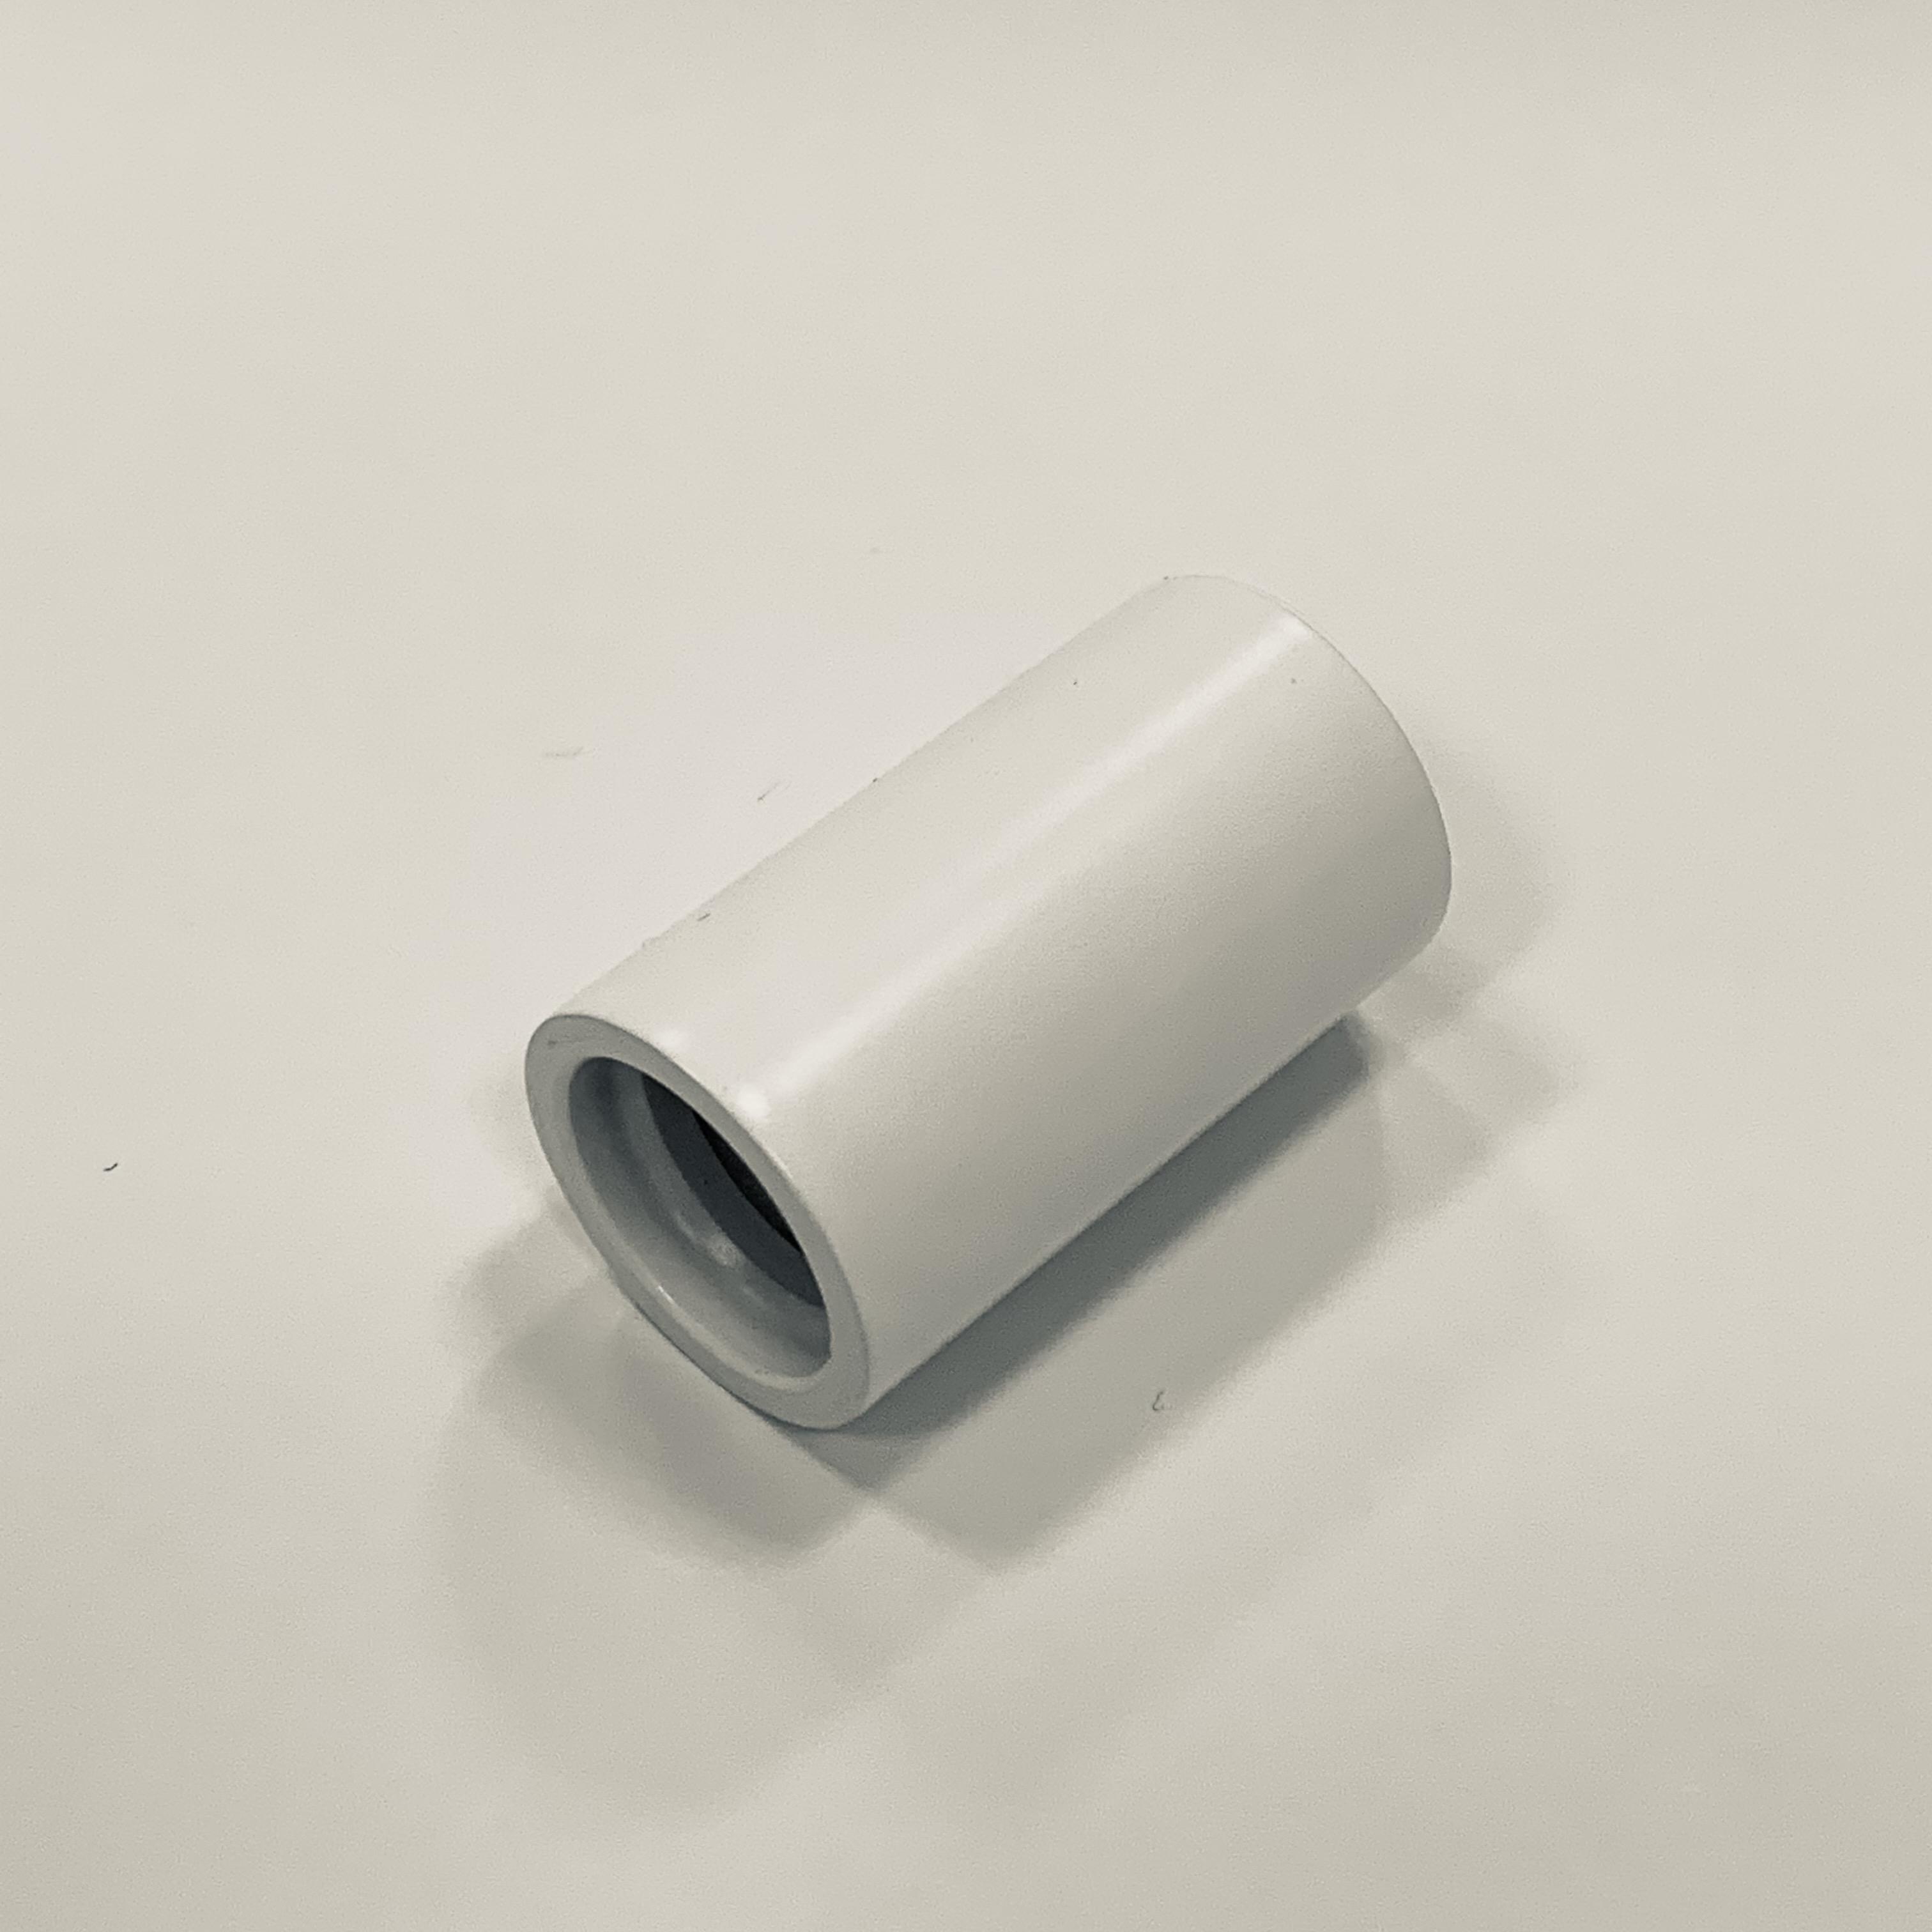 Nivito aerator cover matt white